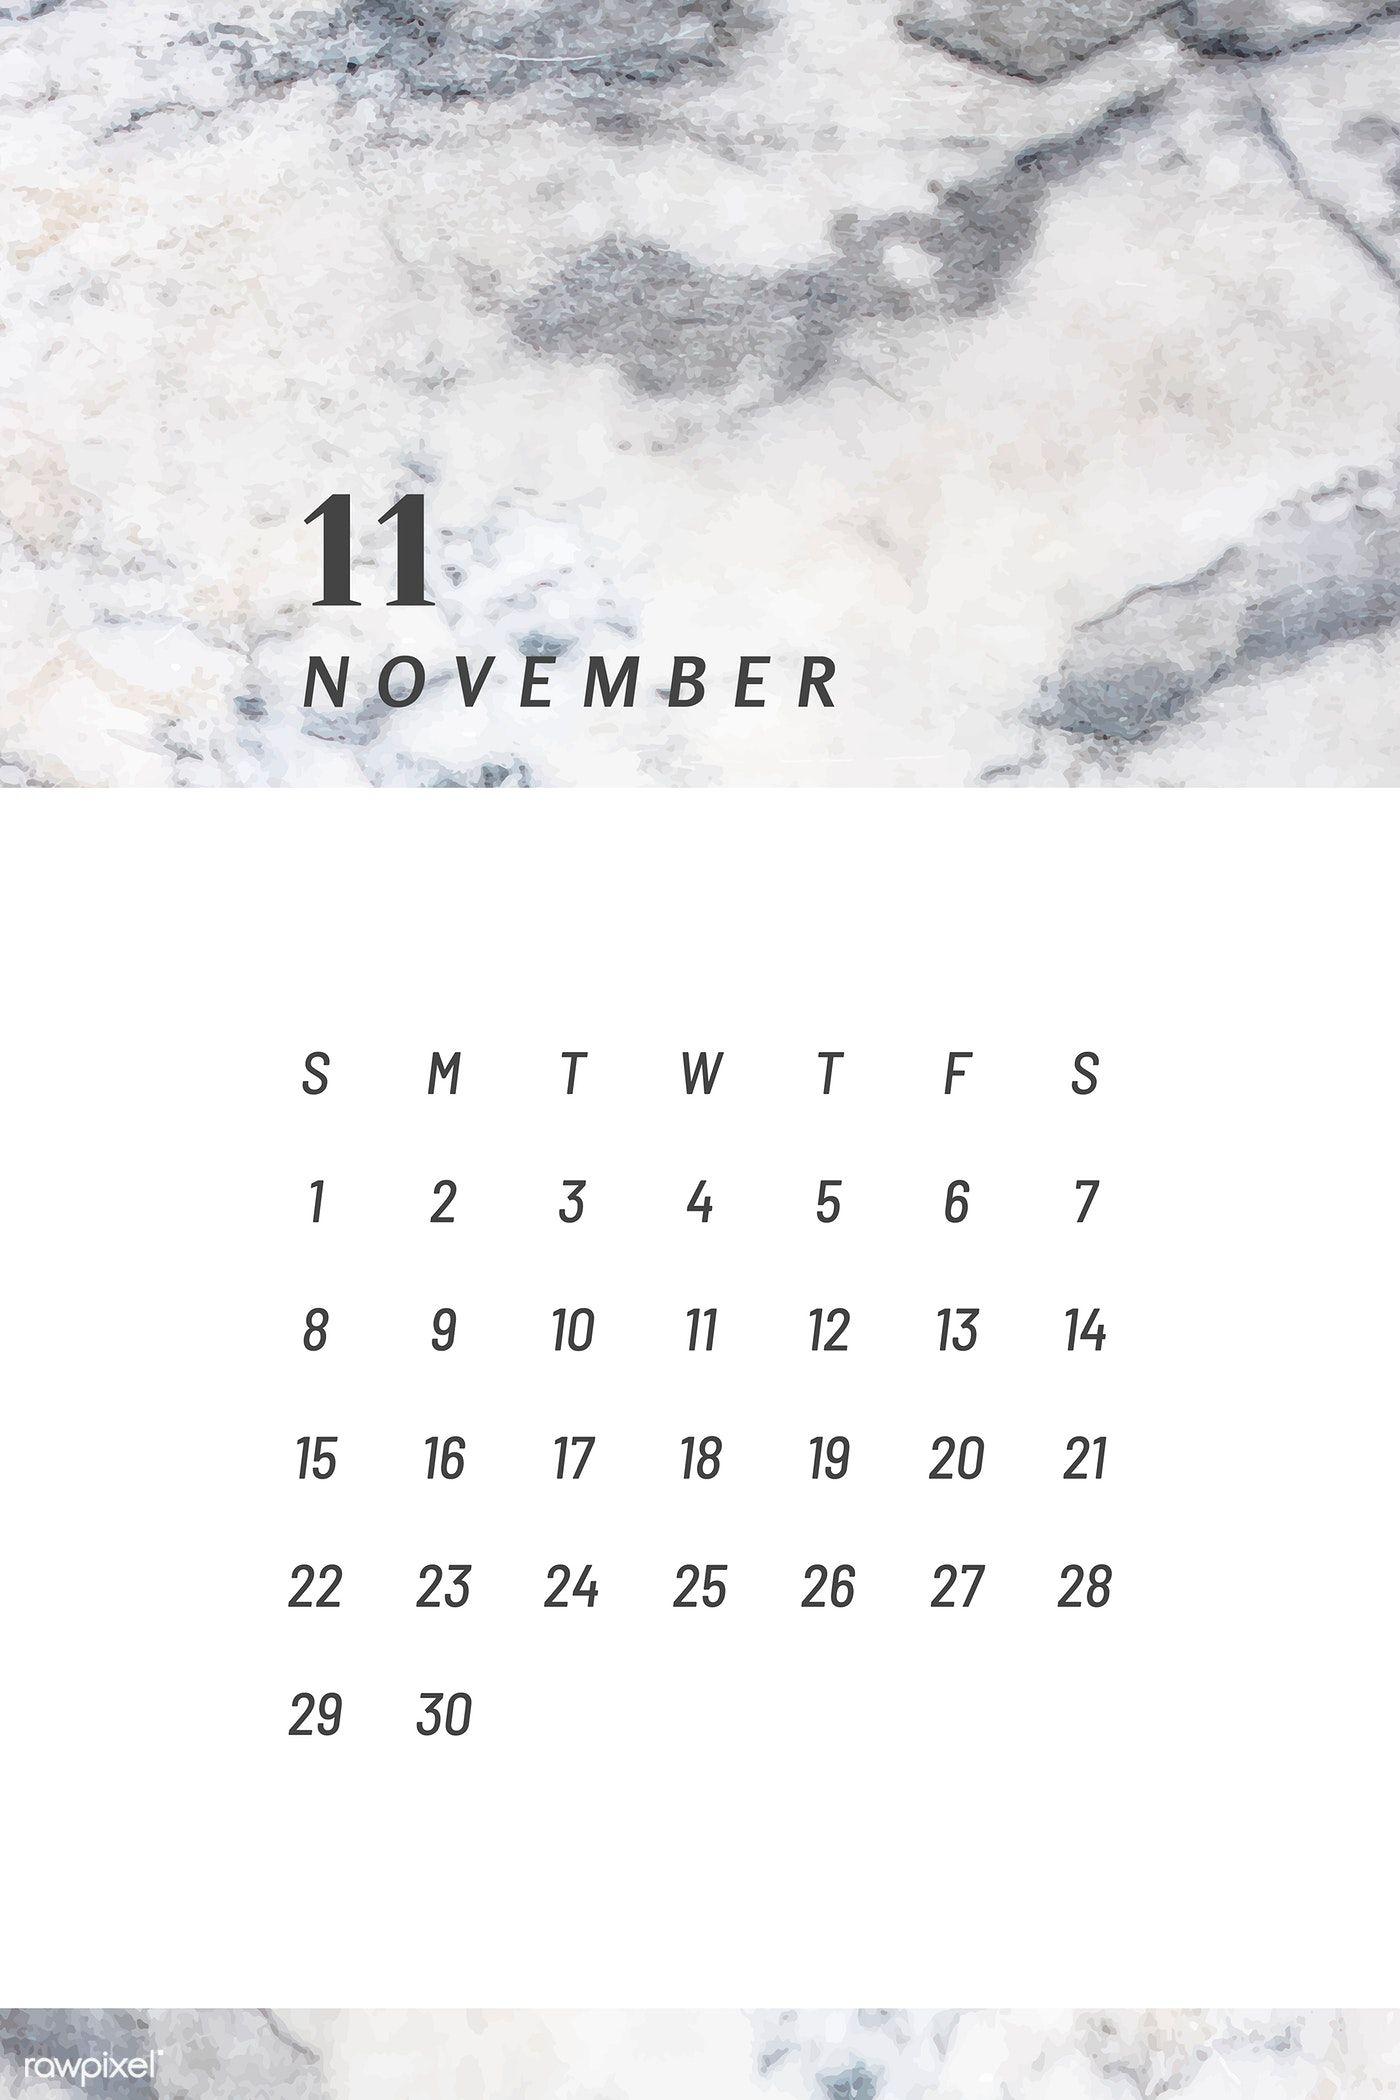 Download premium vector of Black and white November